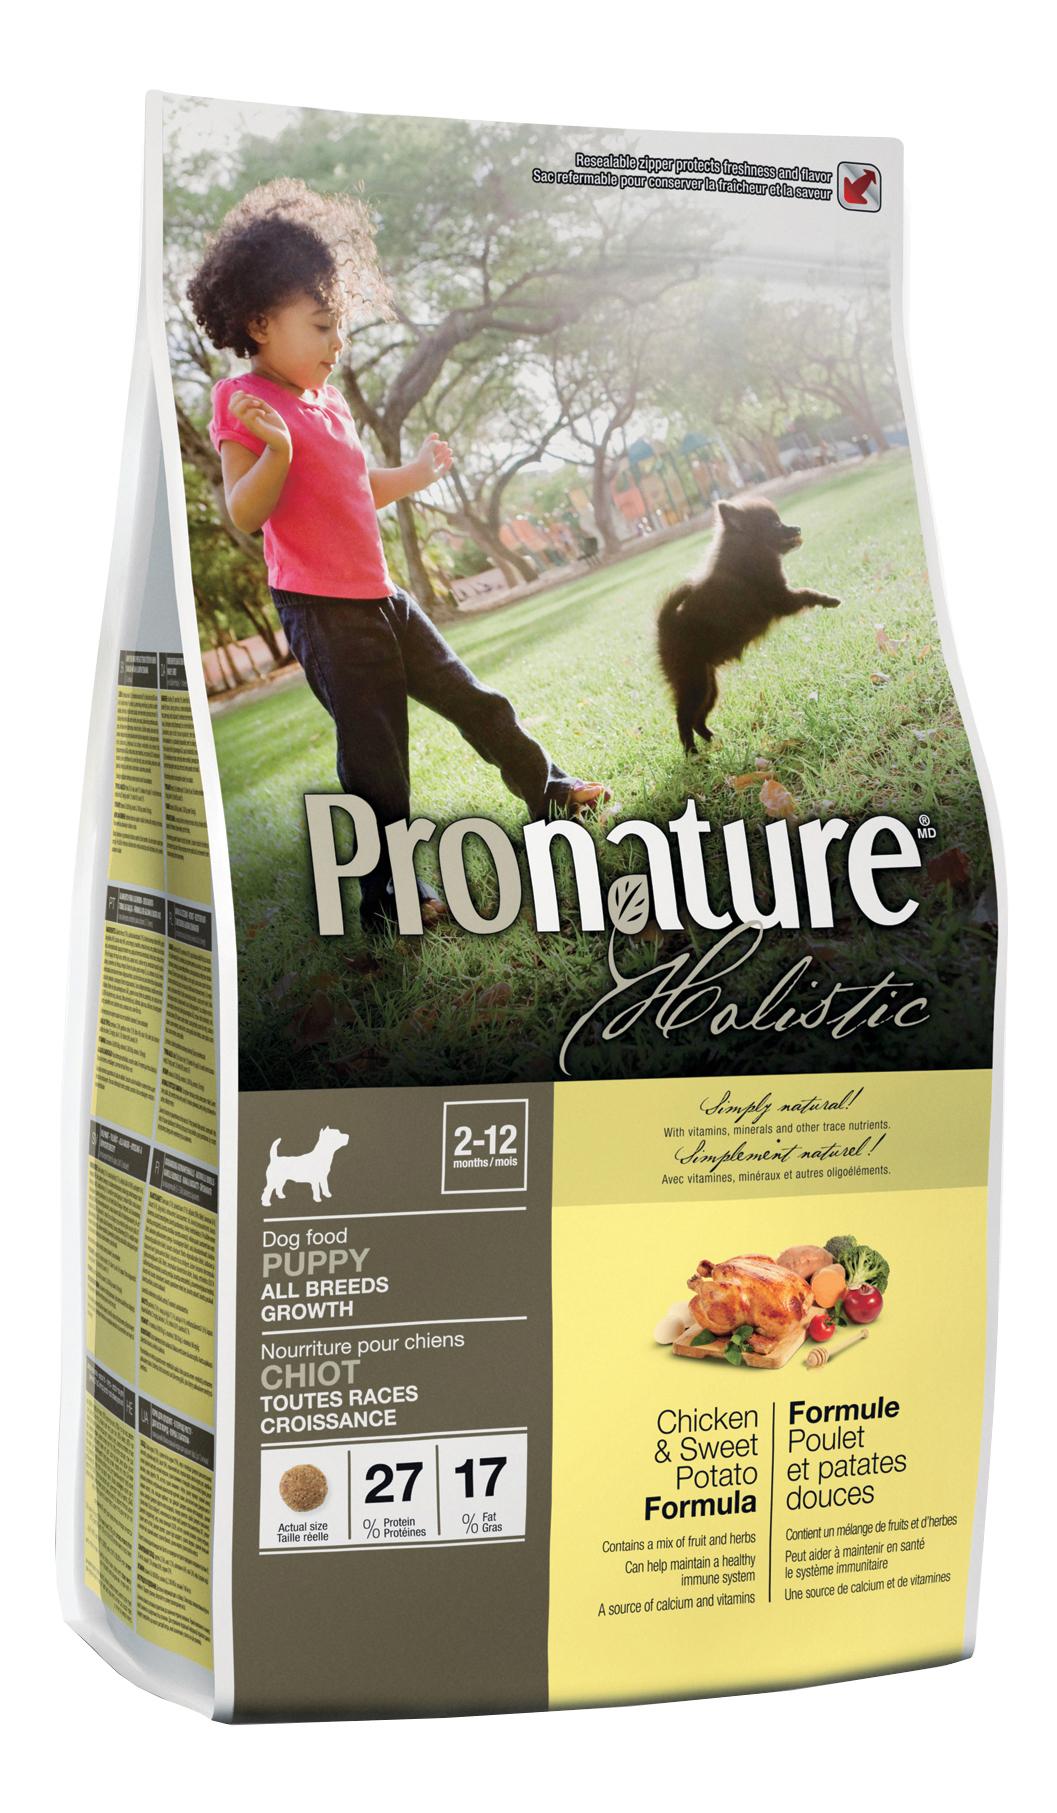 Pronature Корм для щенков, Pronature Holistic, с курицей и сладким картофелем CHICKEN_AND_SWEET_POTATO11.jpg